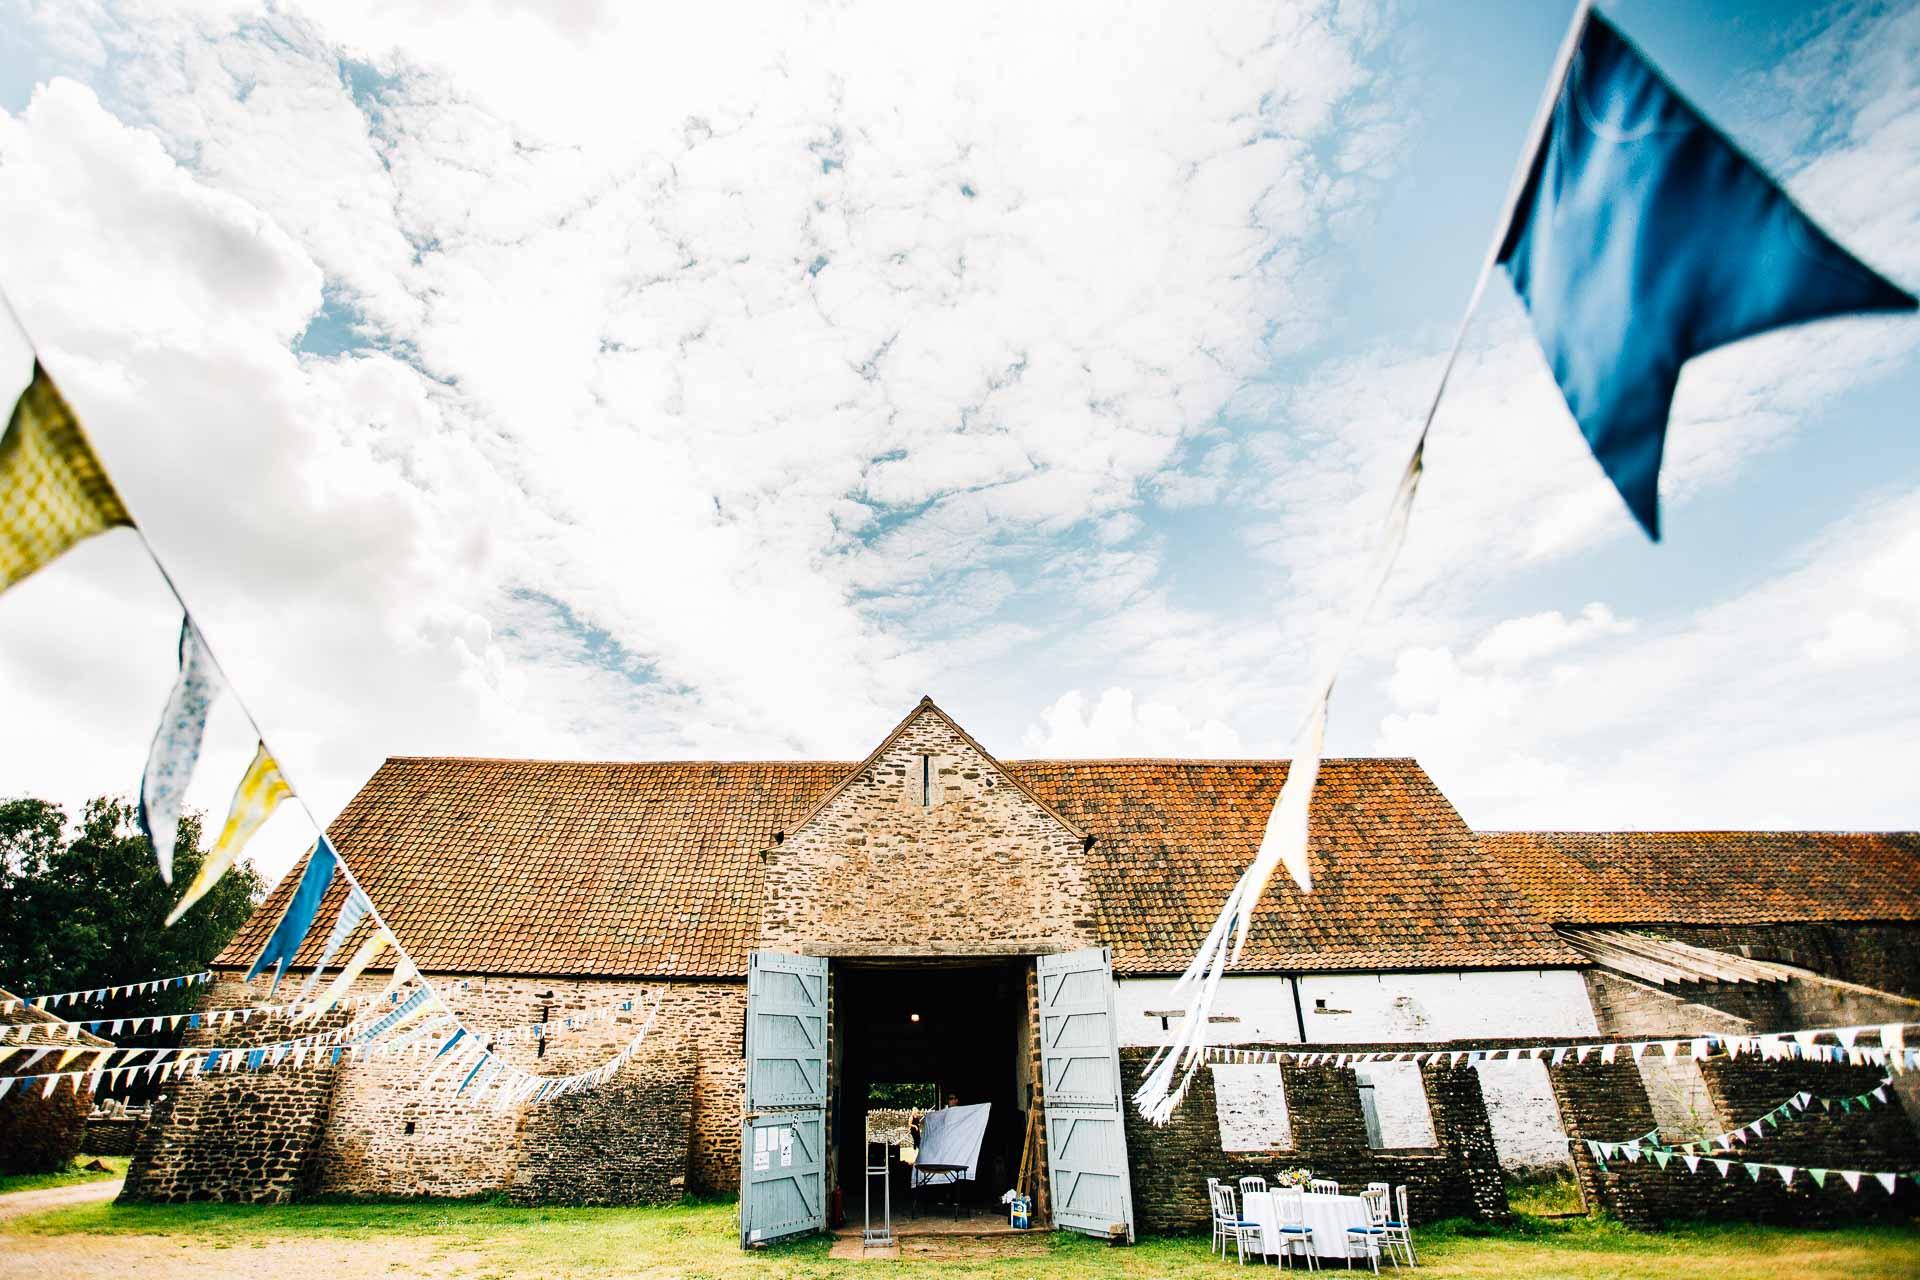 winterbourne-medieval-barn-wedding-photography-emma-andrew-9